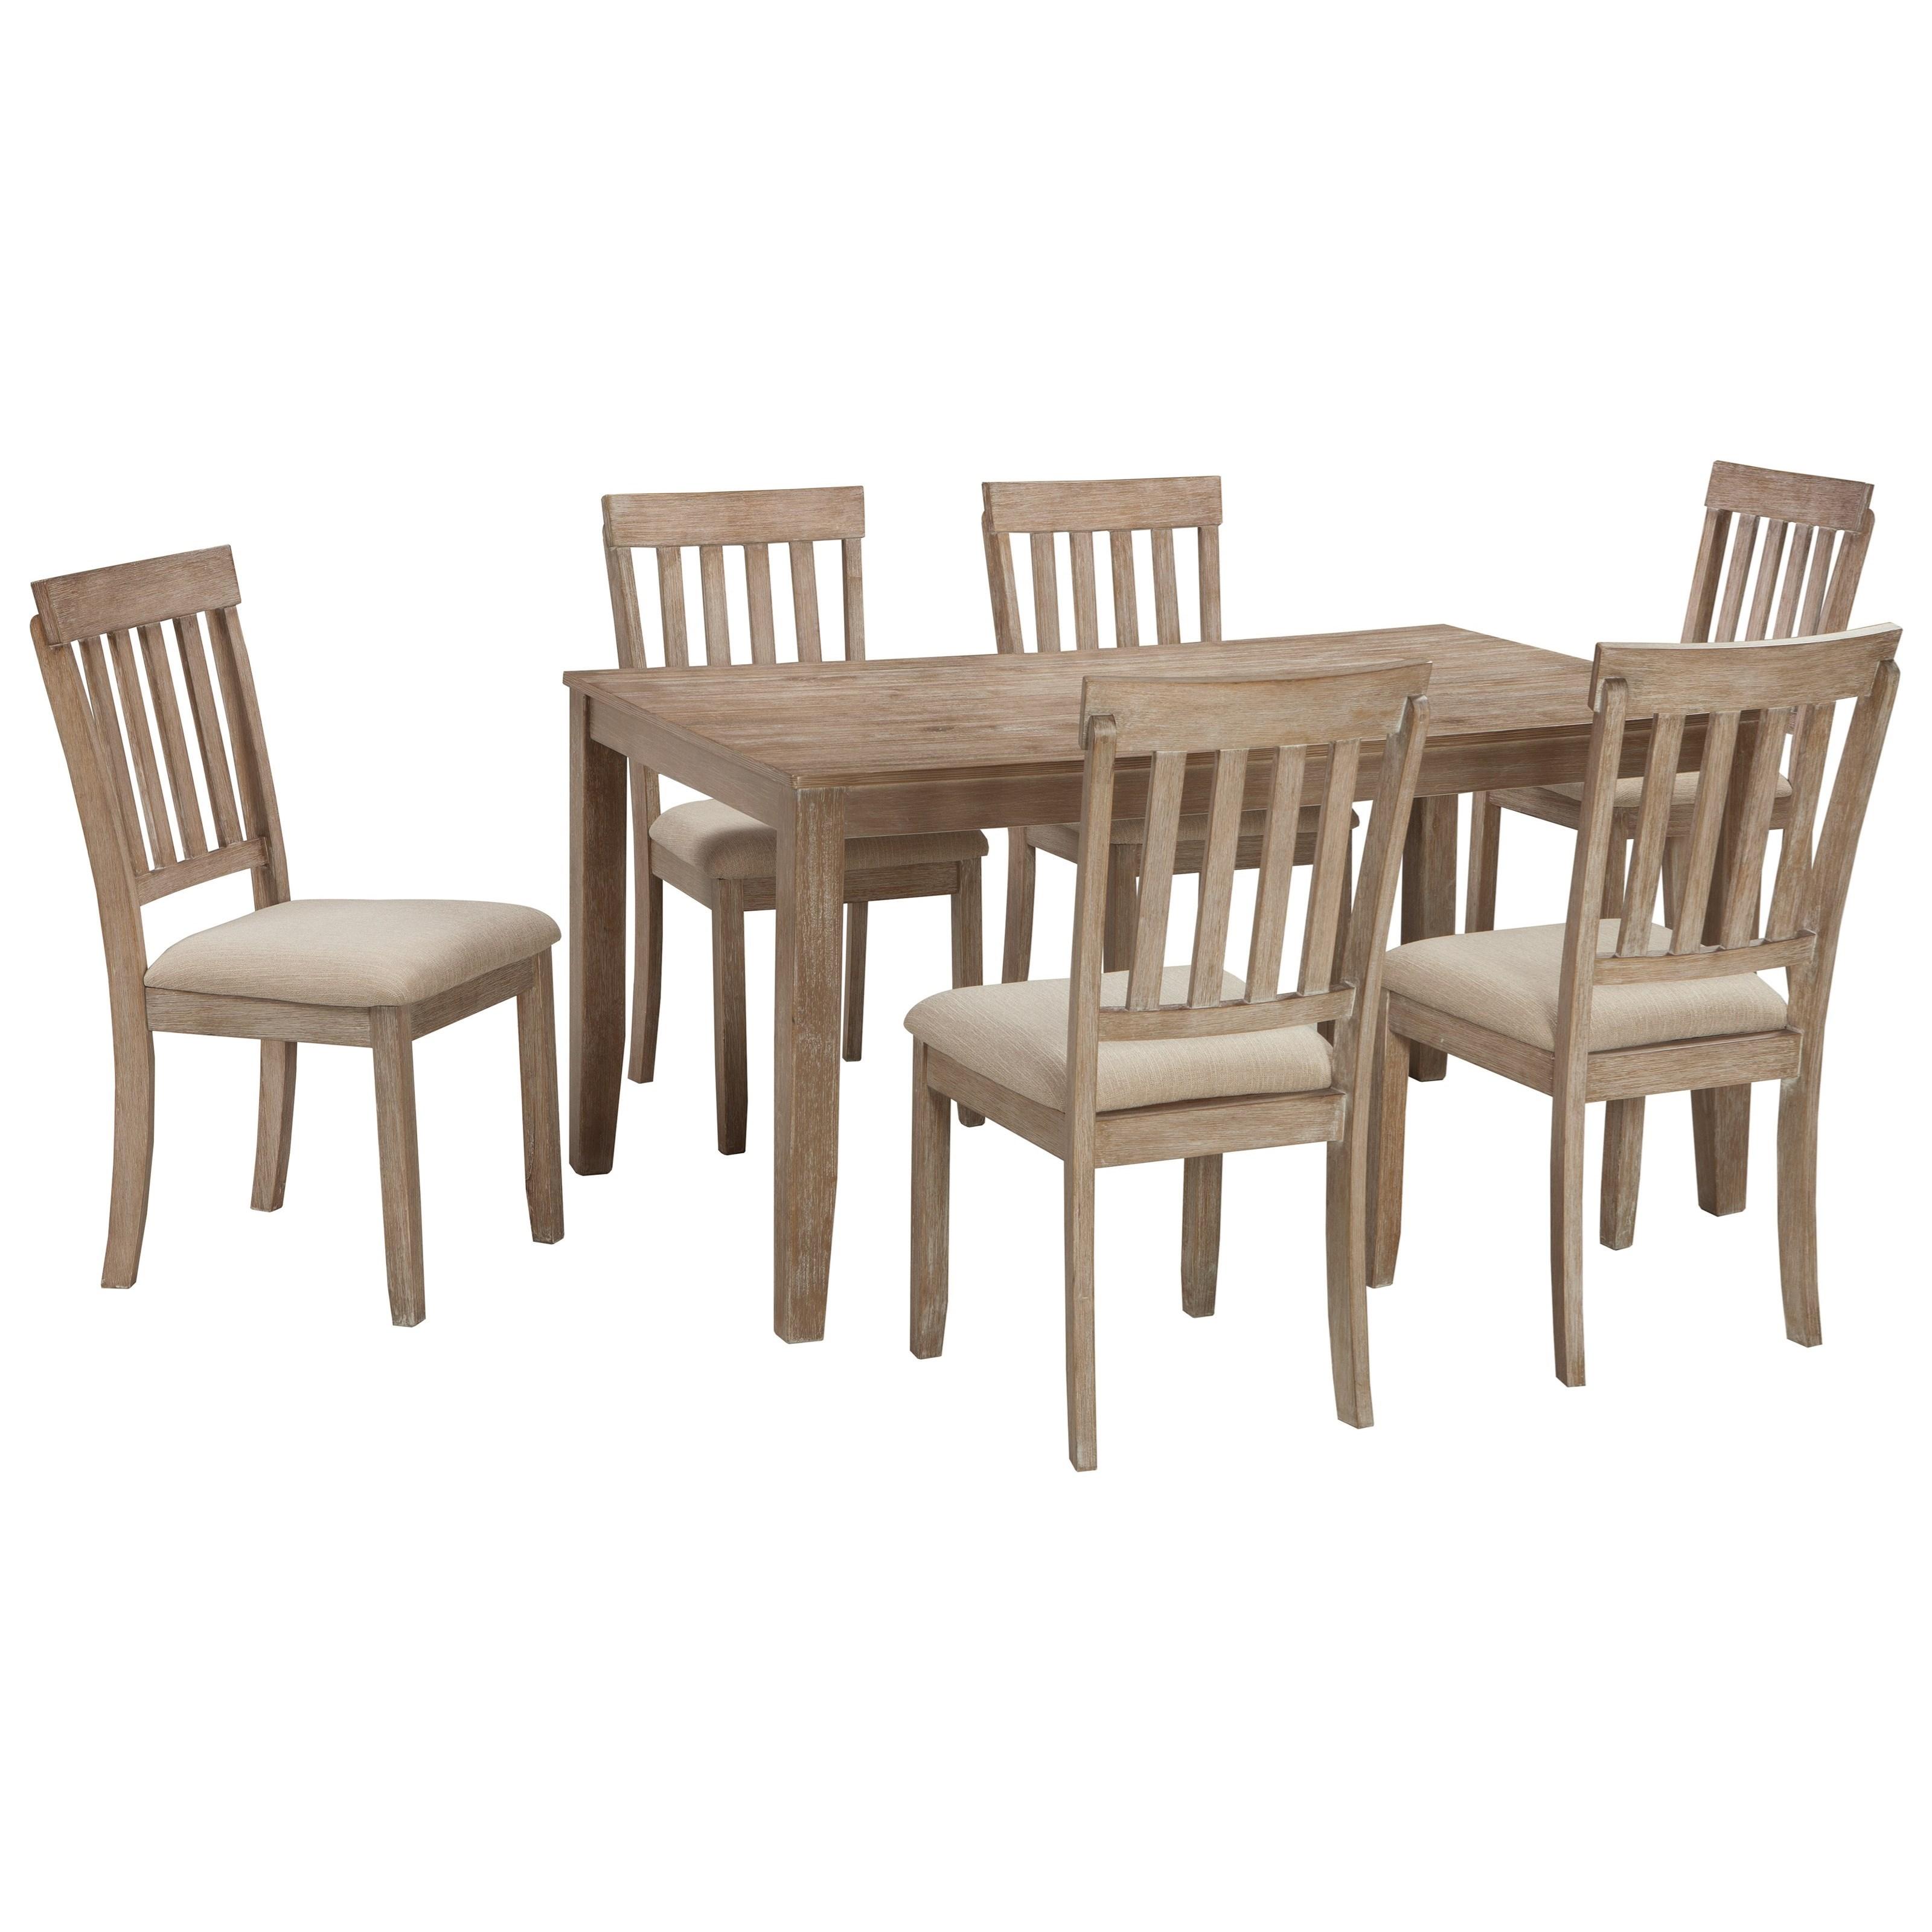 Benchcraft by Ashley MattiloneDining Room Table Set ...  sc 1 st  Royal Furniture & Benchcraft by Ashley Mattilone Casual Dining Room Table Set with 6 ...